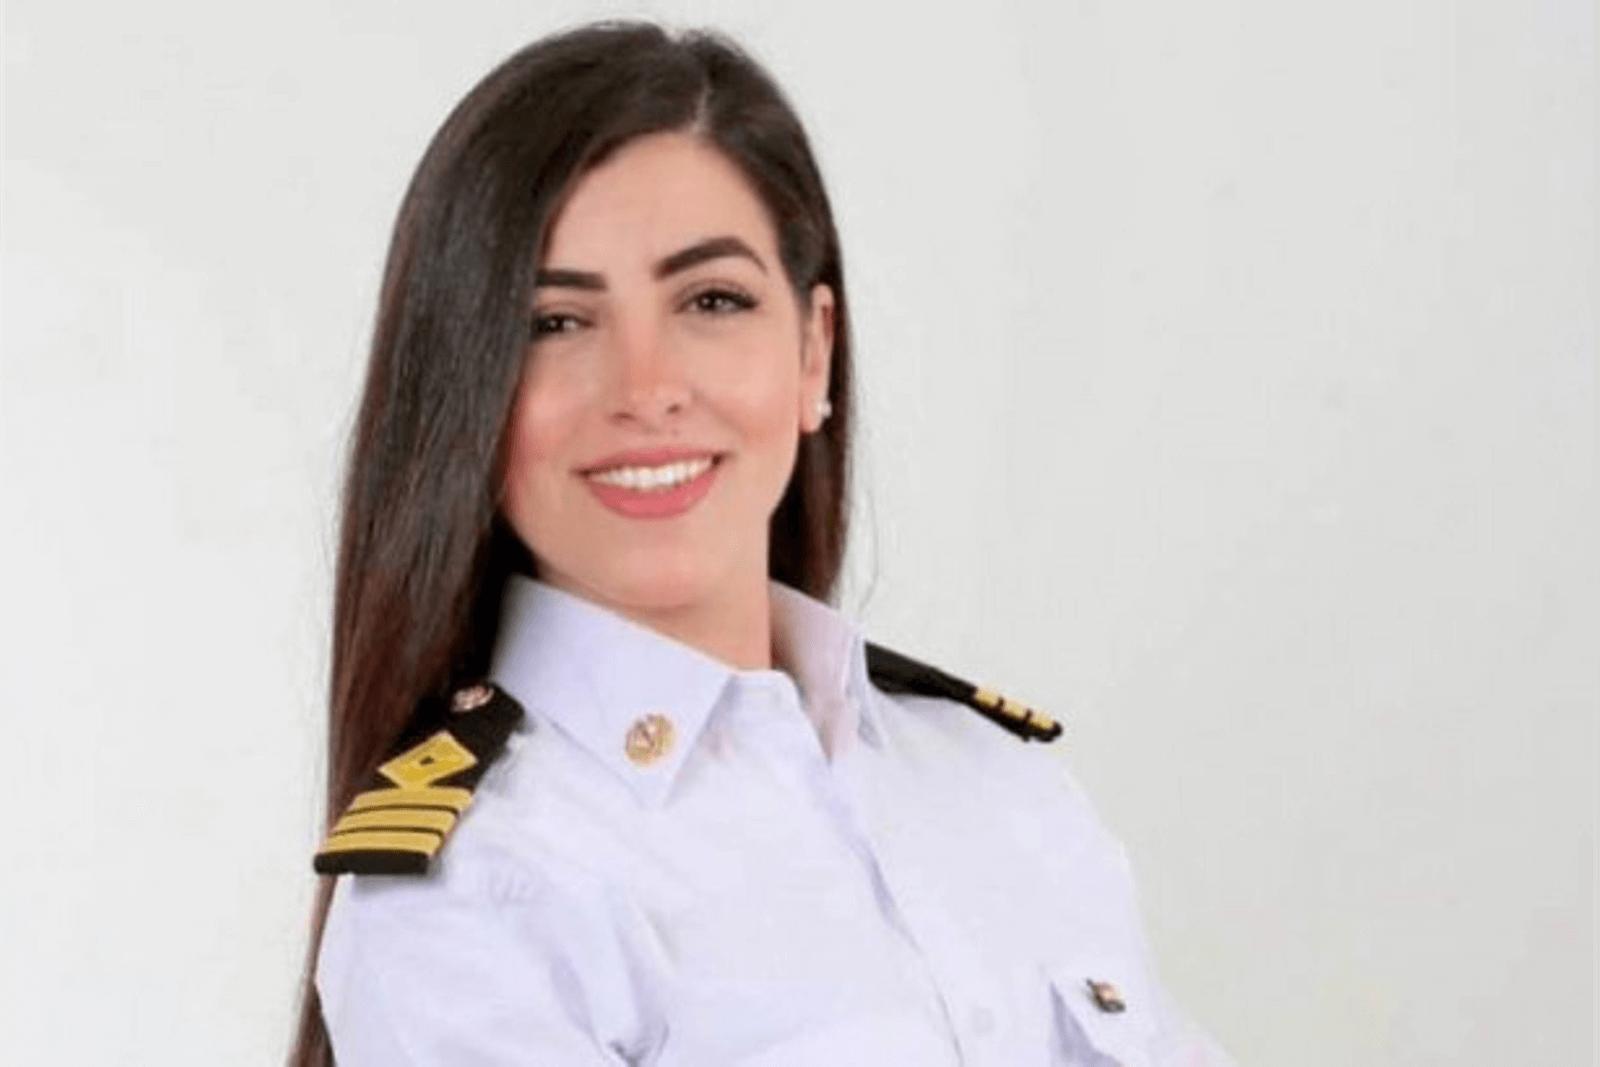 Egypt's first female ship captain Marwa Elselehdar says 'blamed for blocking Suez Canal'